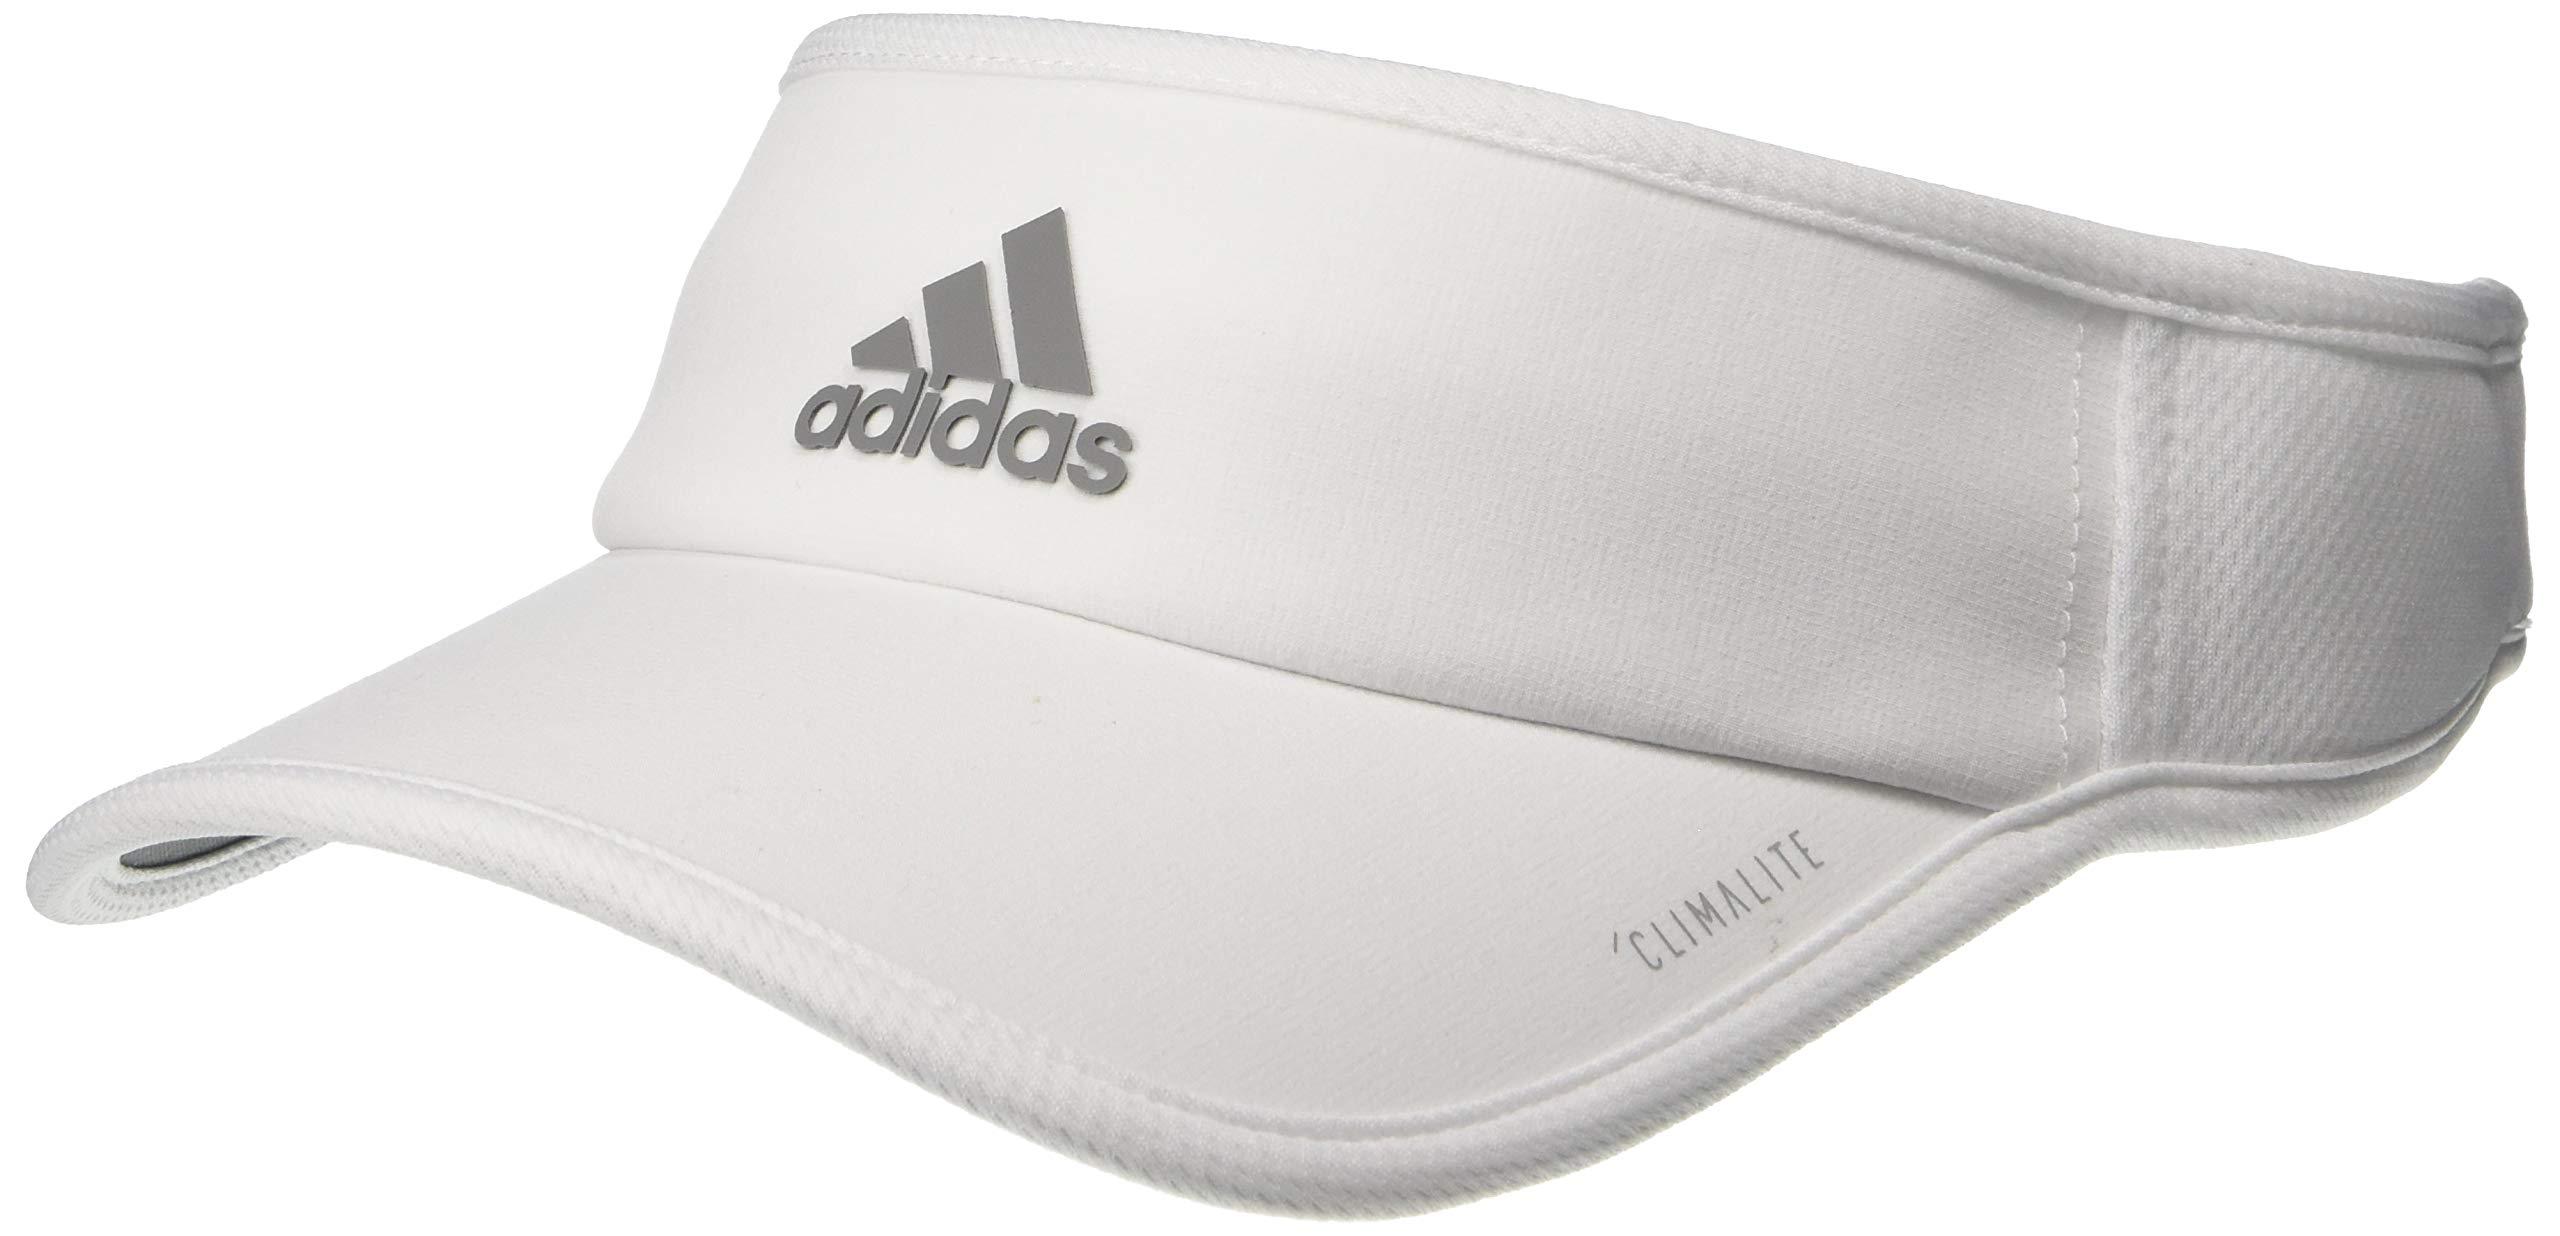 adidas Women's Superlite Performance Visor, White/Light Onix, ONE SIZE by adidas